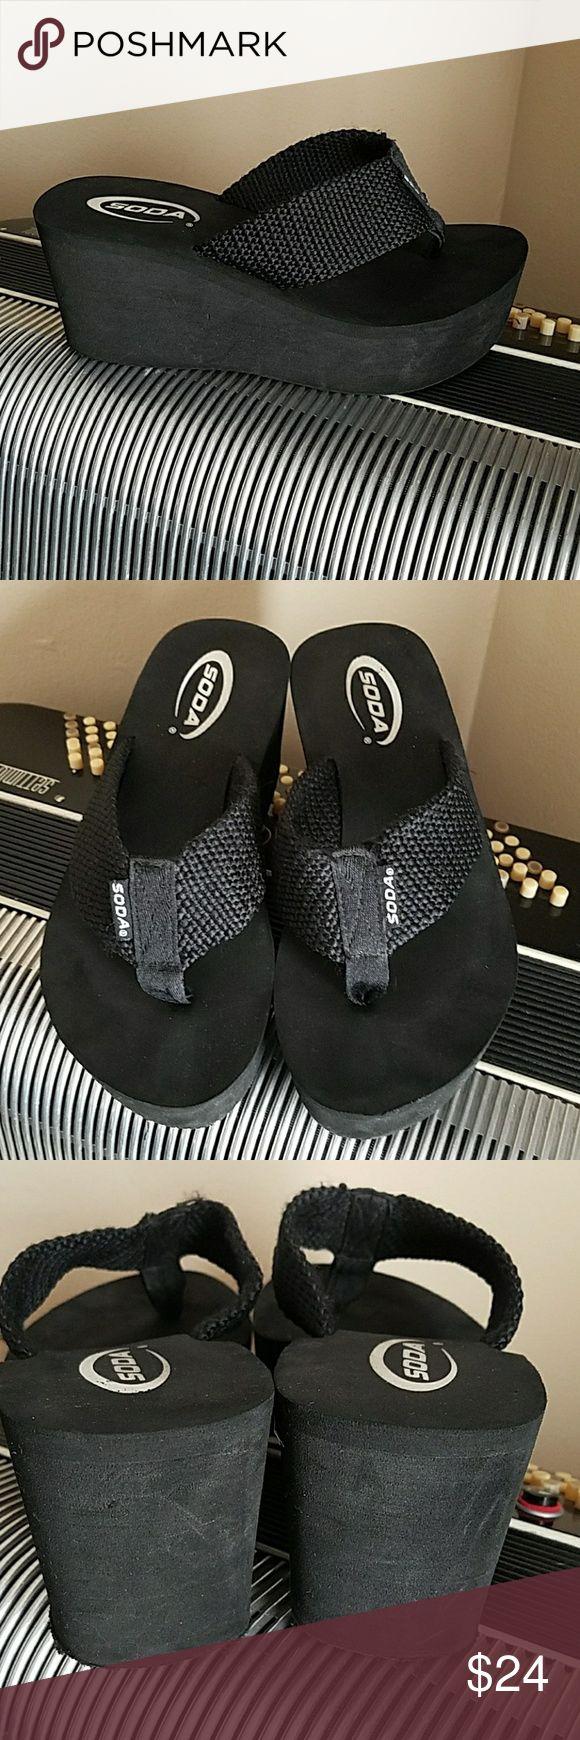 SODA BLACK WEDGE WEAVE FABRIC FLIP FLOPS SODA BLACK WEDGE WEAVE FABRIC FLIP FLOPS.  Worn a handful of times.   Size 8 Soda Shoes Sandals